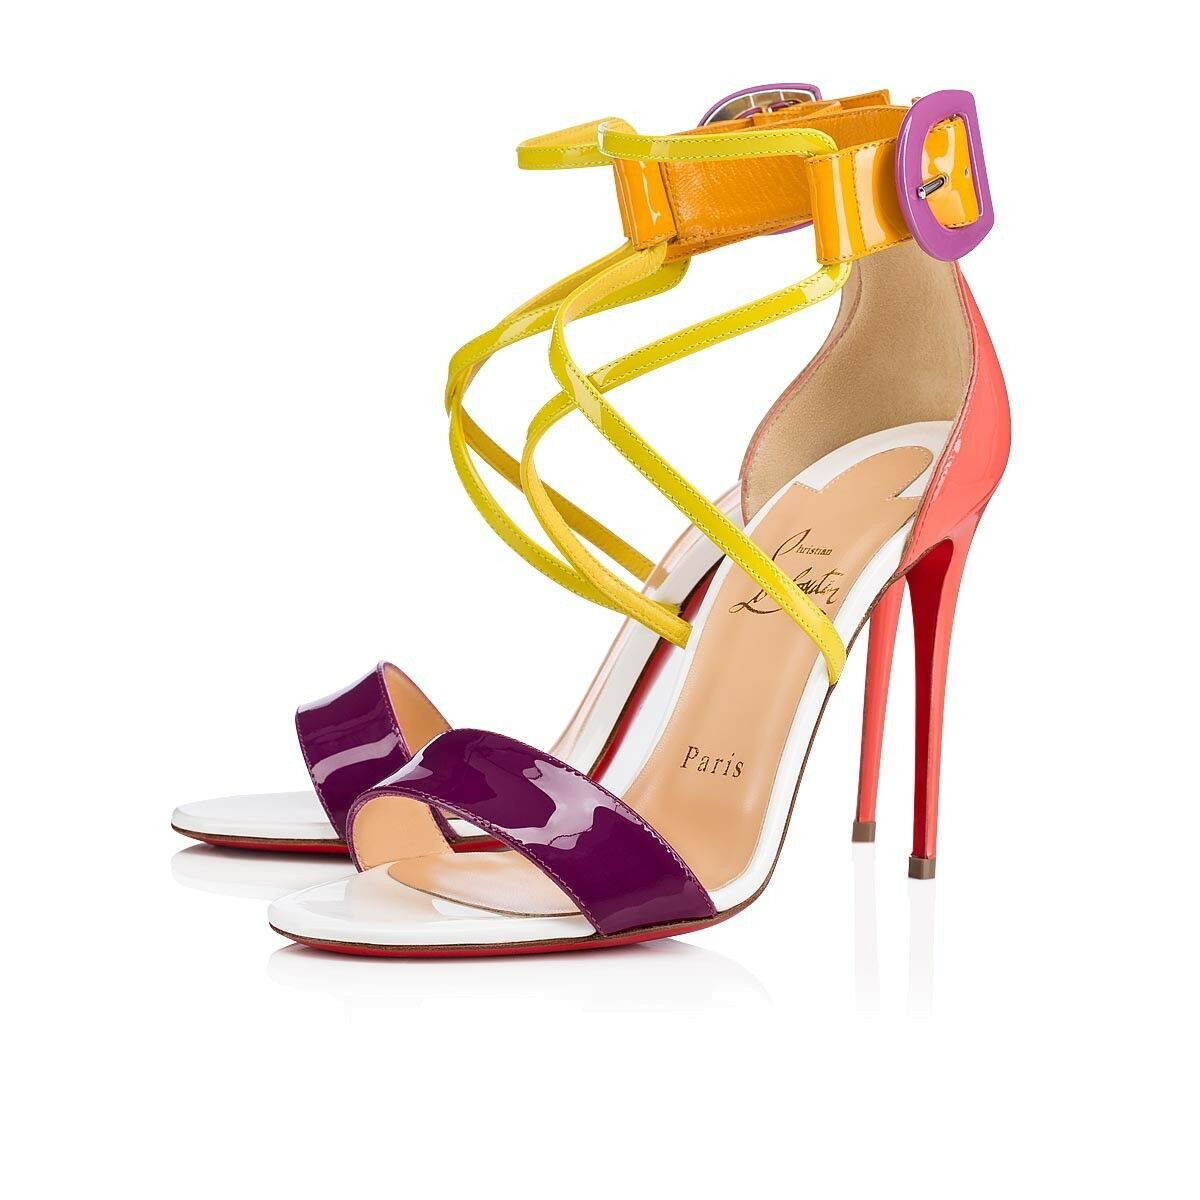 NIB Christian Louboutin Choca 100 Patent Criss Cross Strap Sandal Heel Pump 36.5